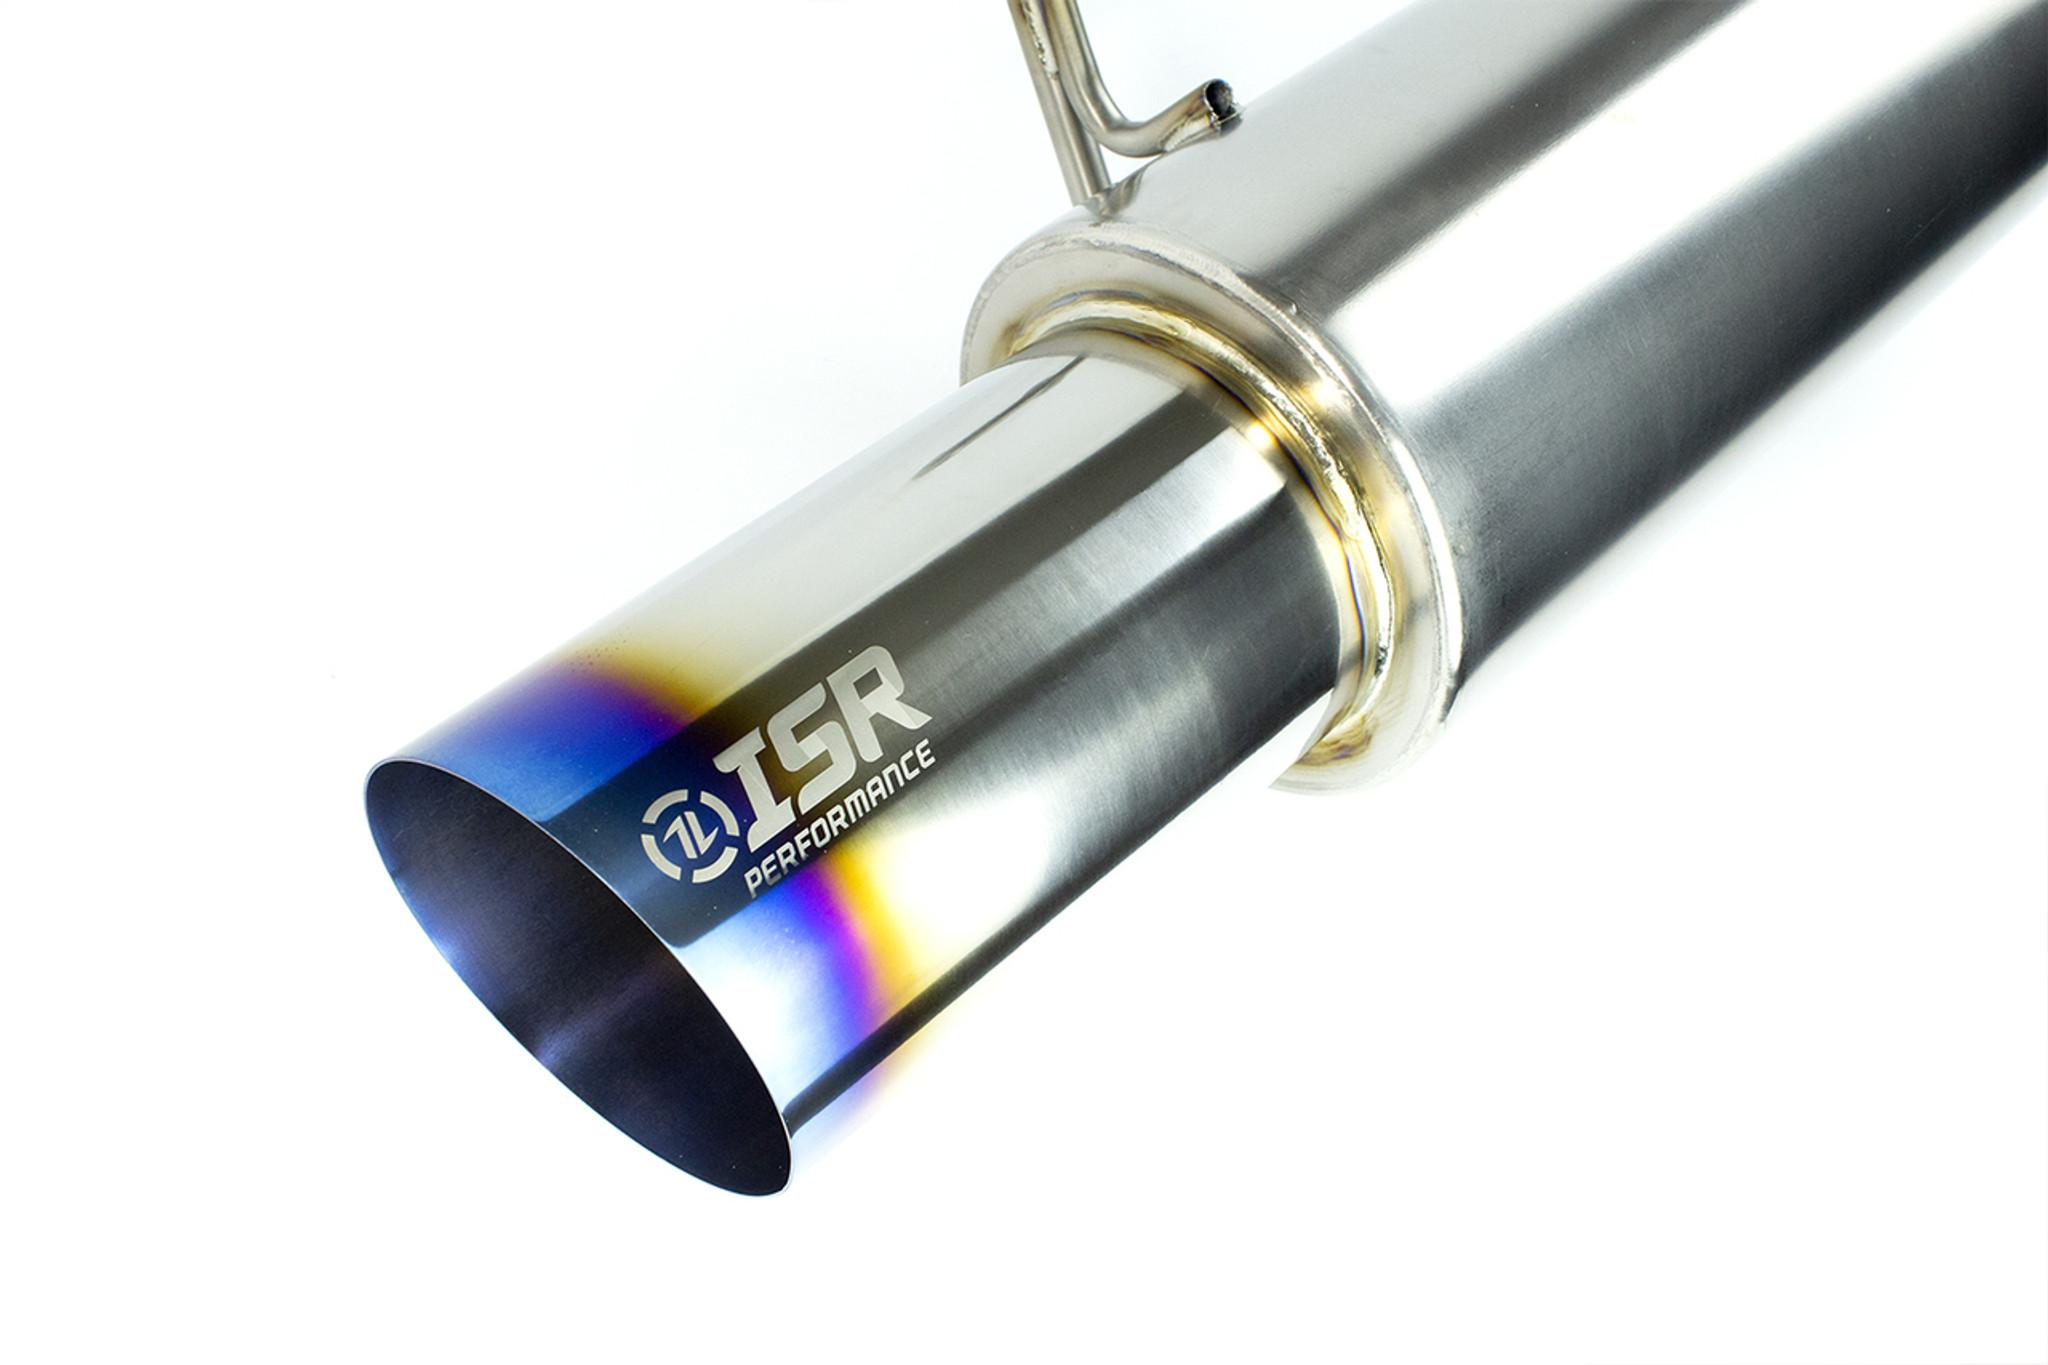 "For Chevrolet Cavalier 2.2L 4/"" Titanium Burn Tip Catback Exhaust Muffler System"